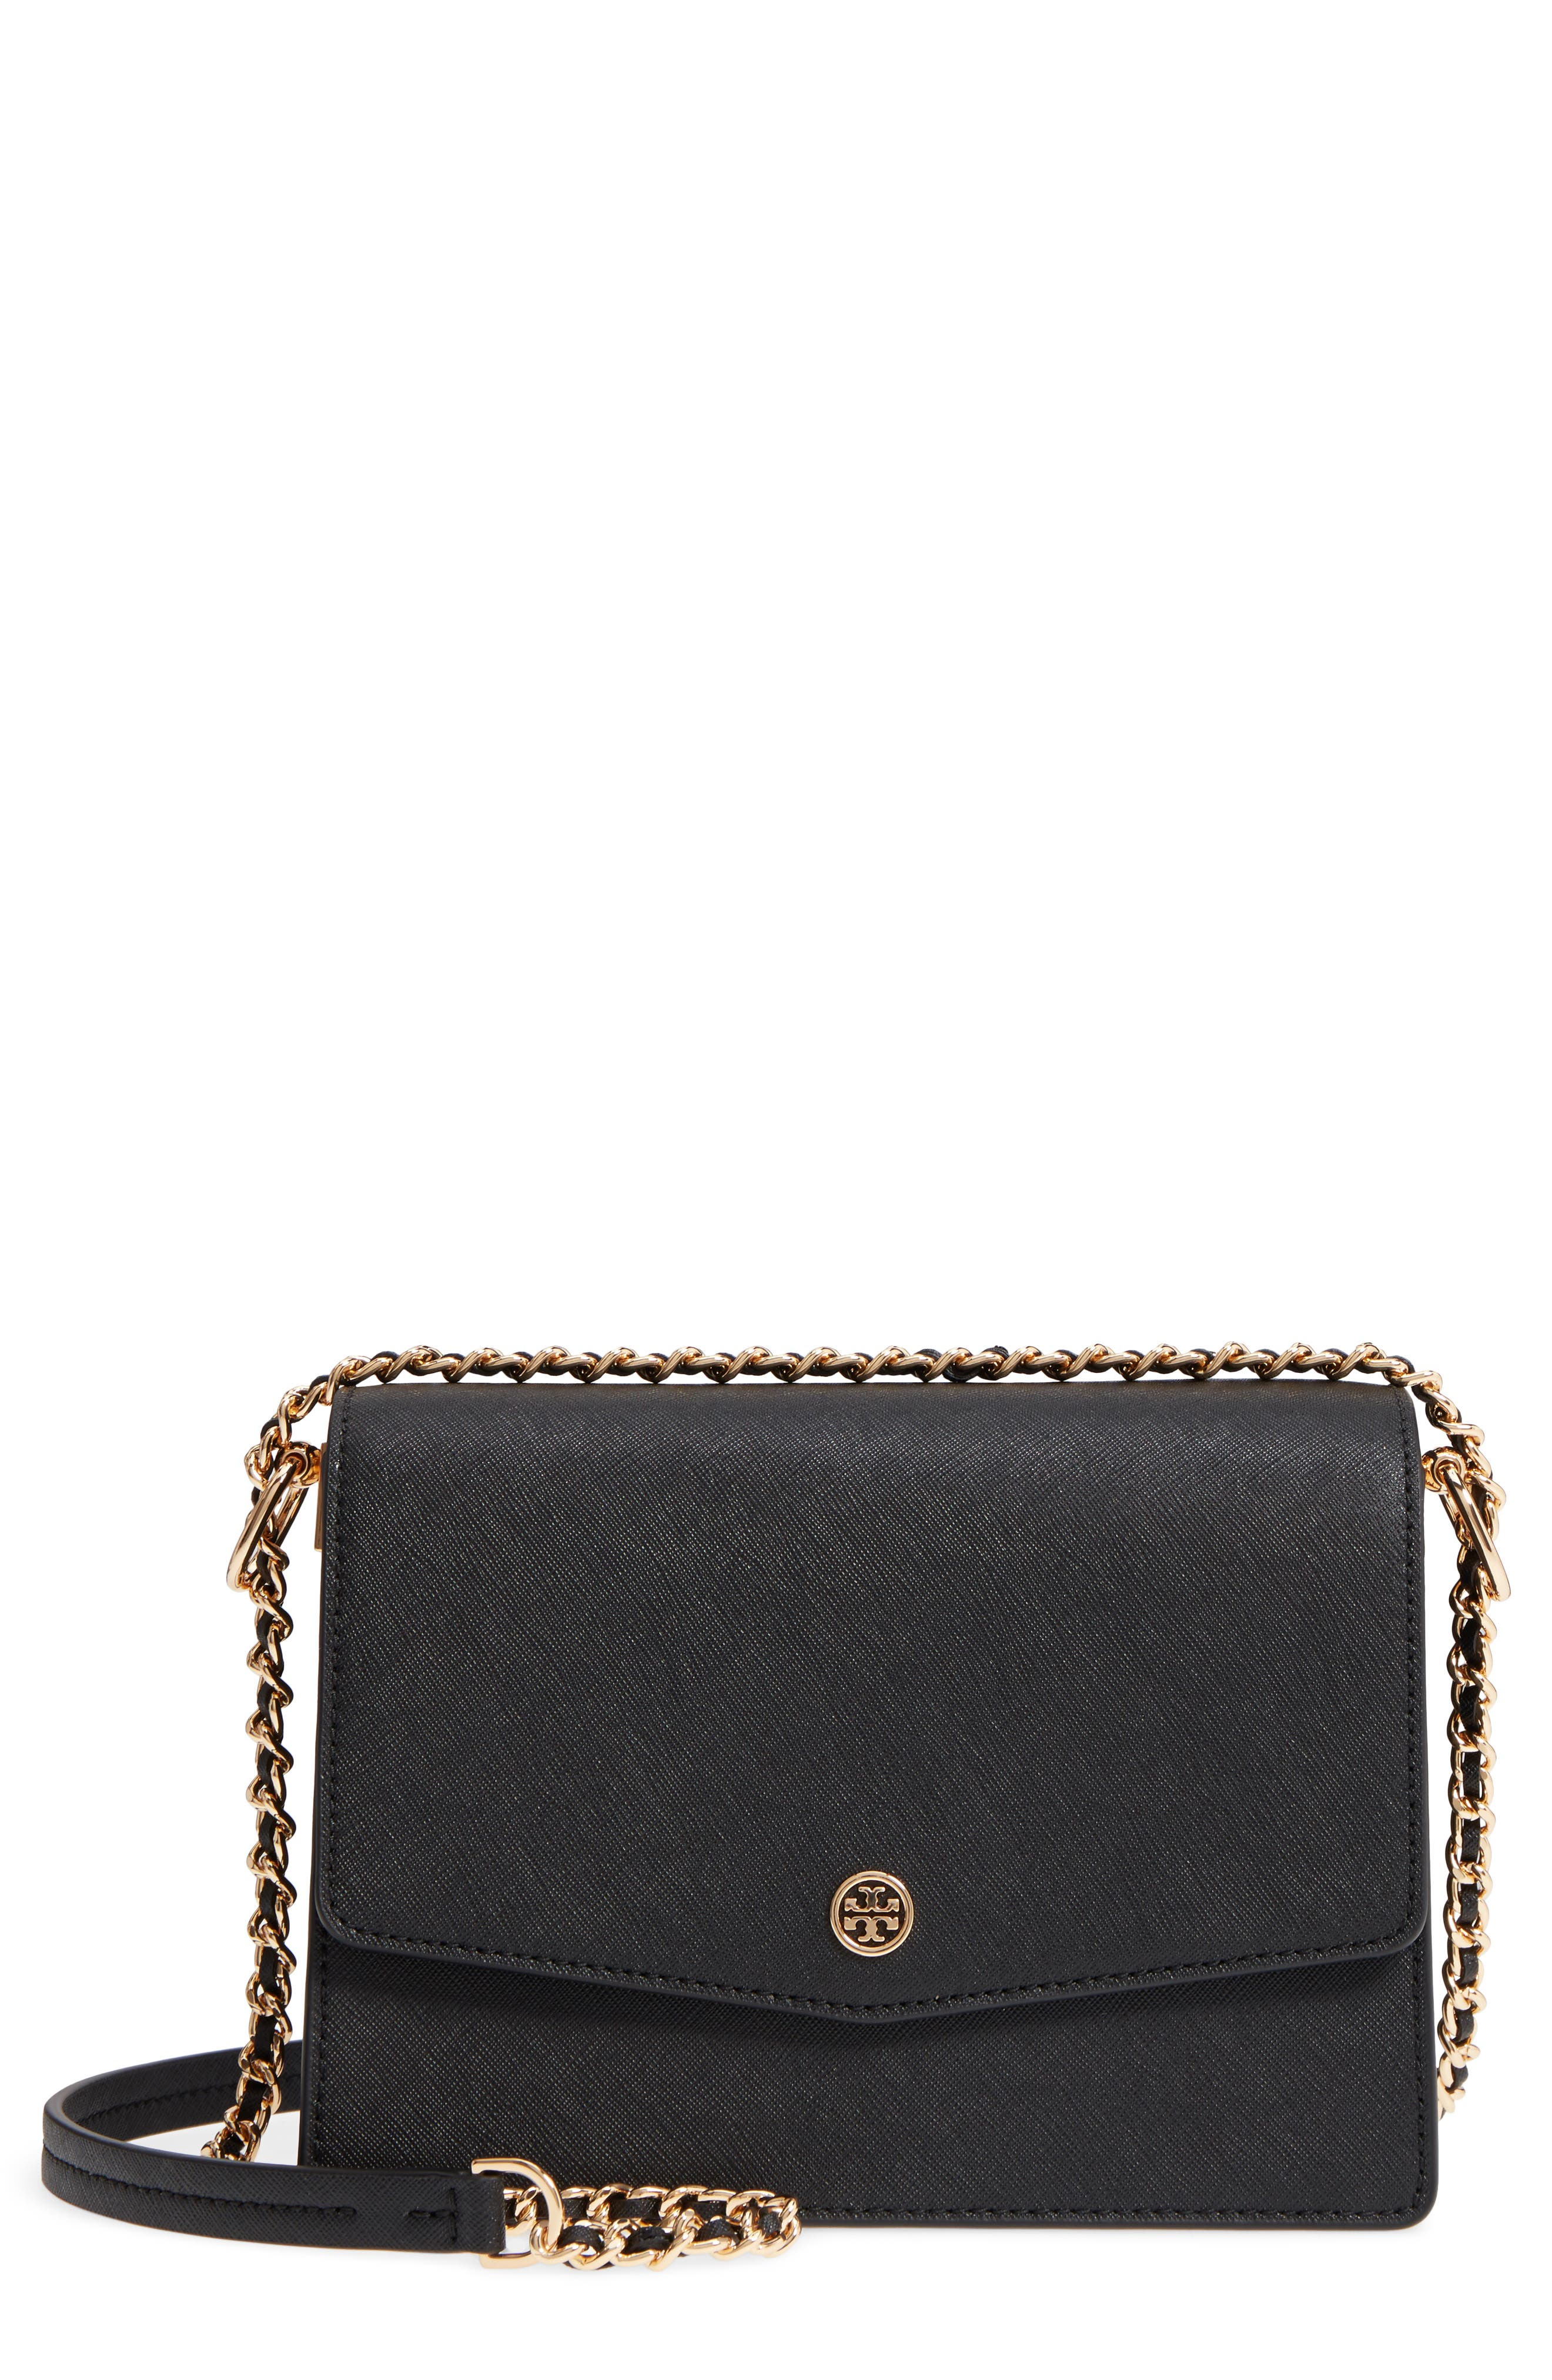 Robinson Convertible Leather Shoulder Bag,                         Main,                         color, BLACK / ROYAL NAVY